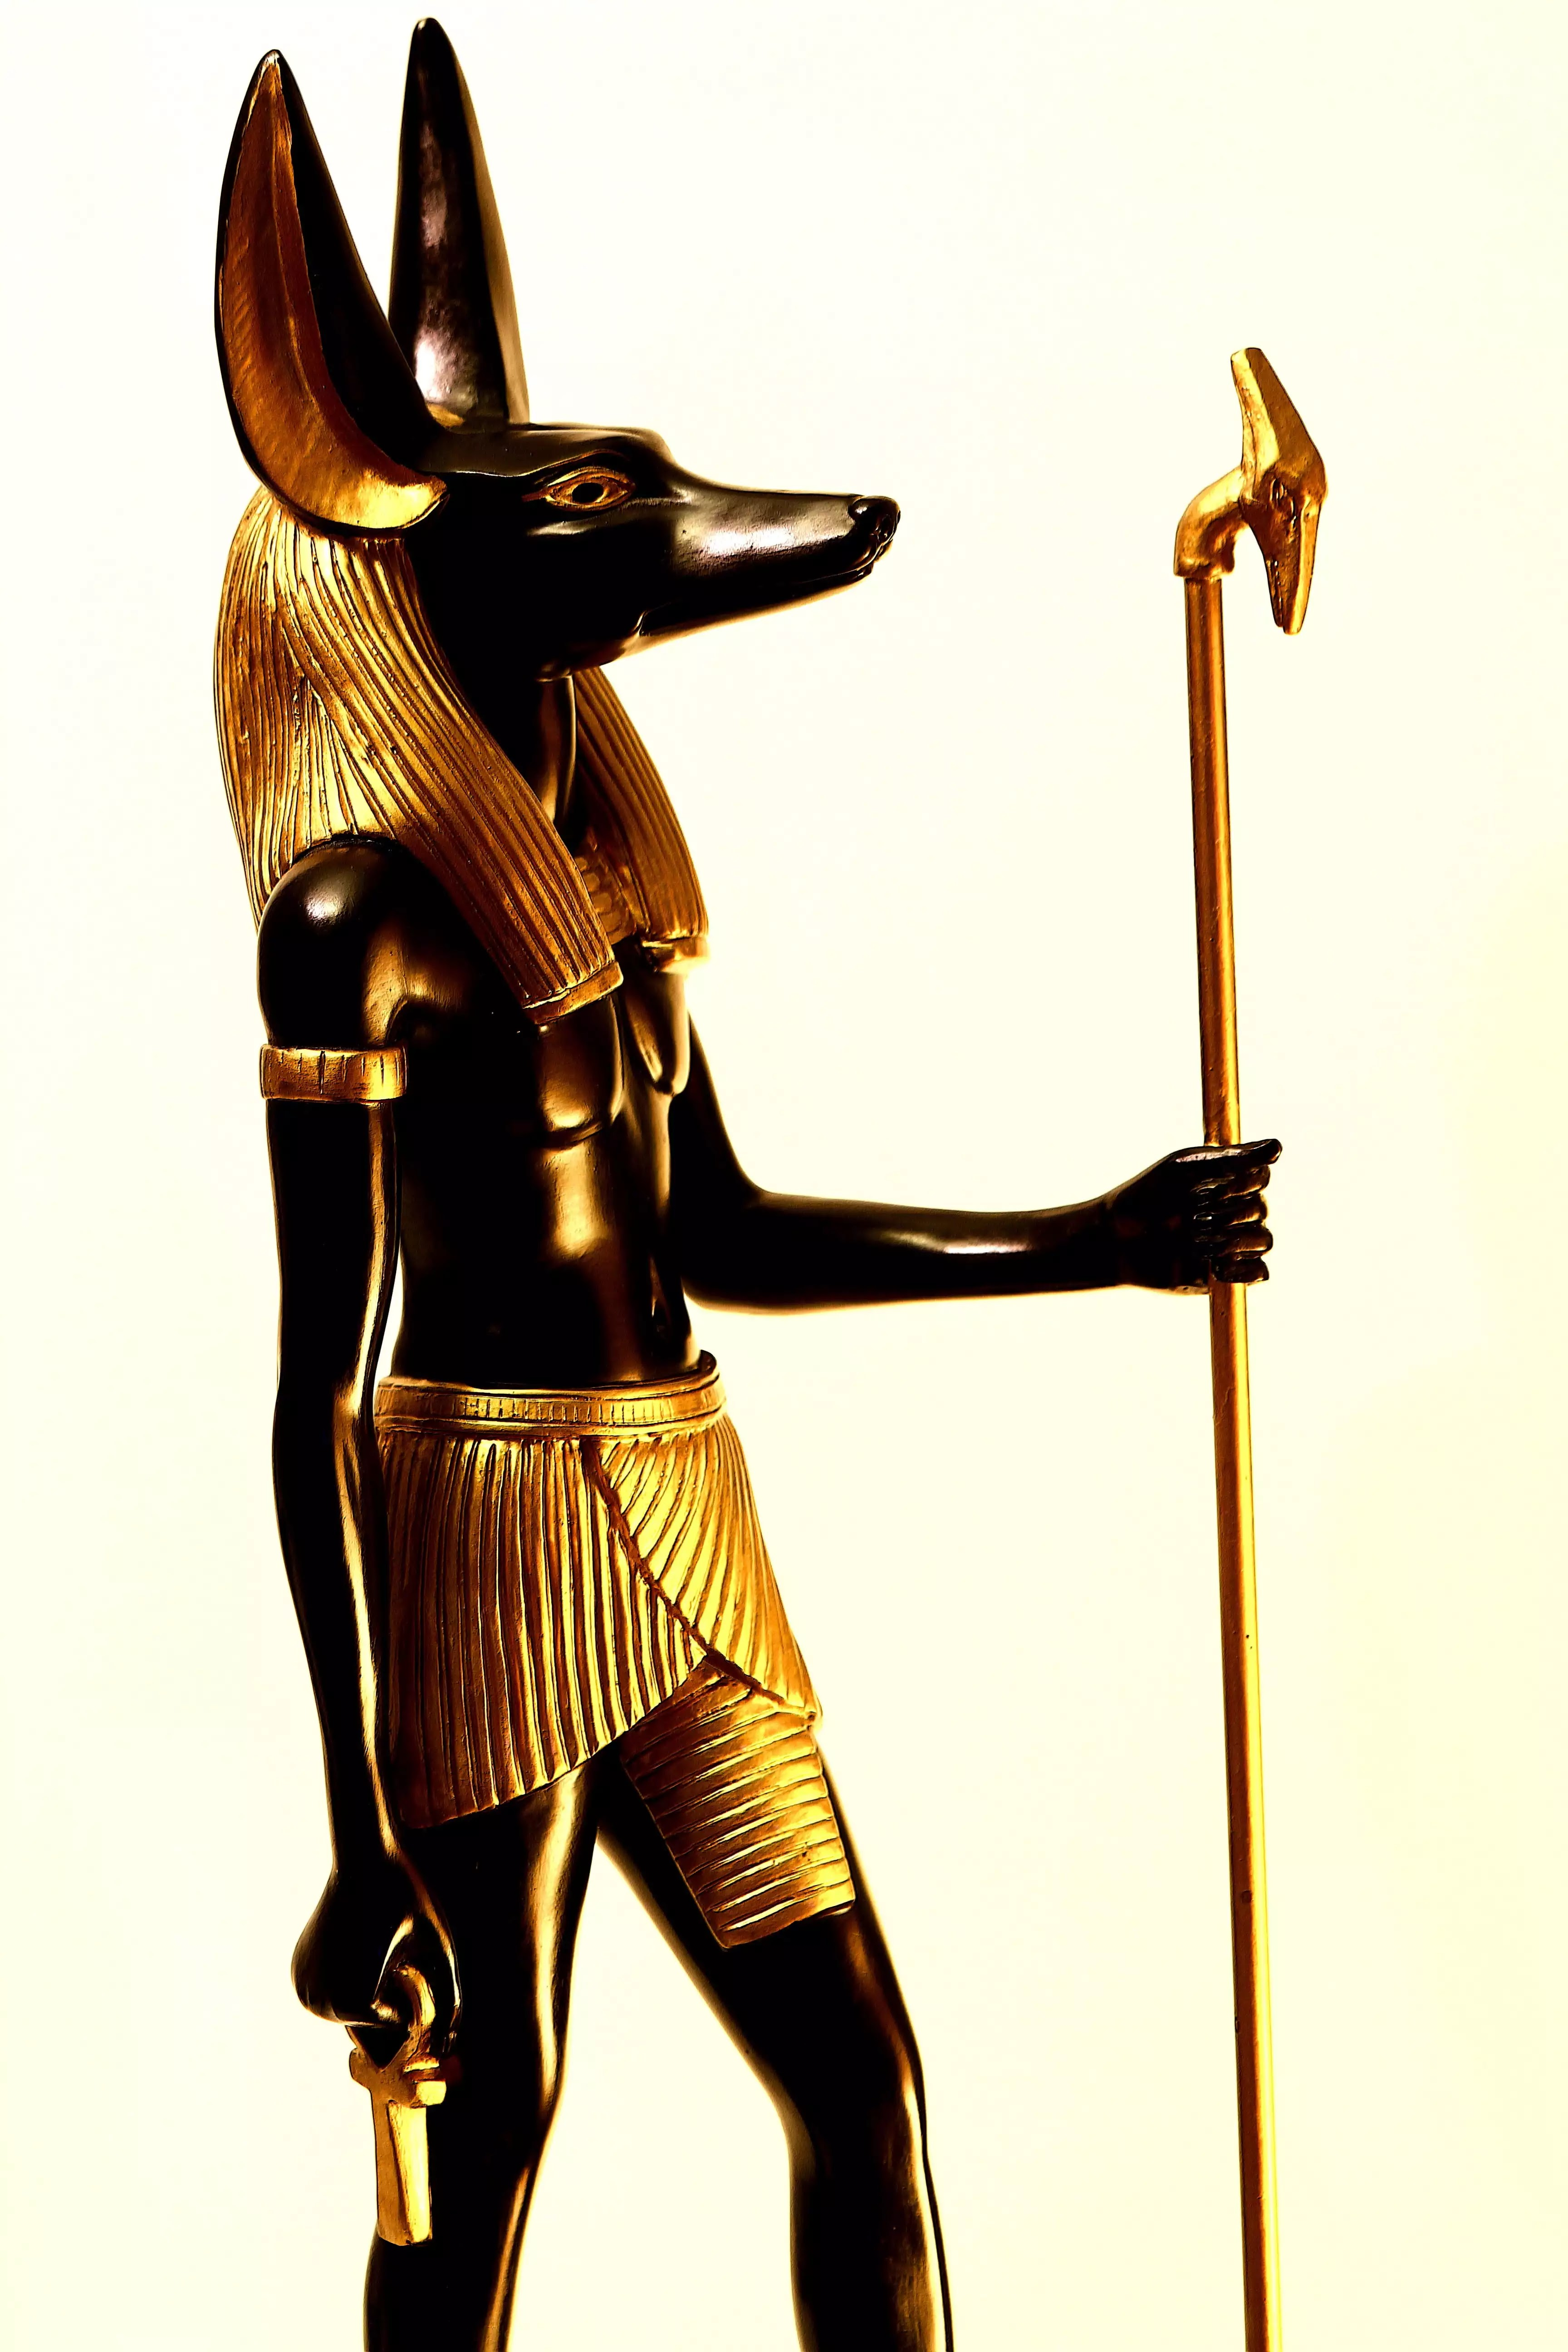 anubis dios de la muerte, chacal egipcio, anubis egipto, anubis dios